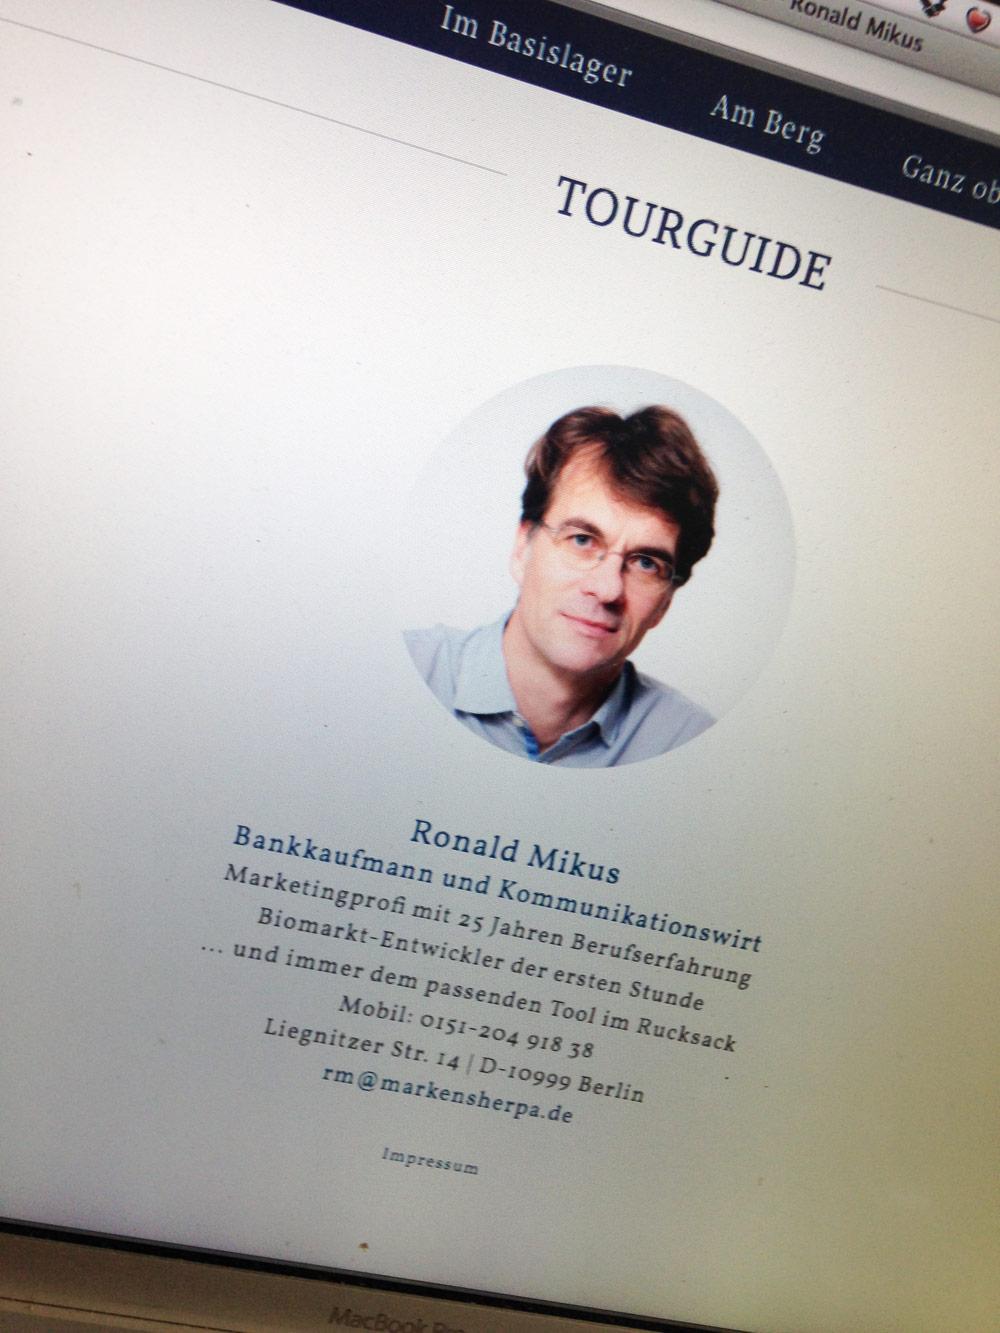 2016-Markensherpa-Webseite-tourguide